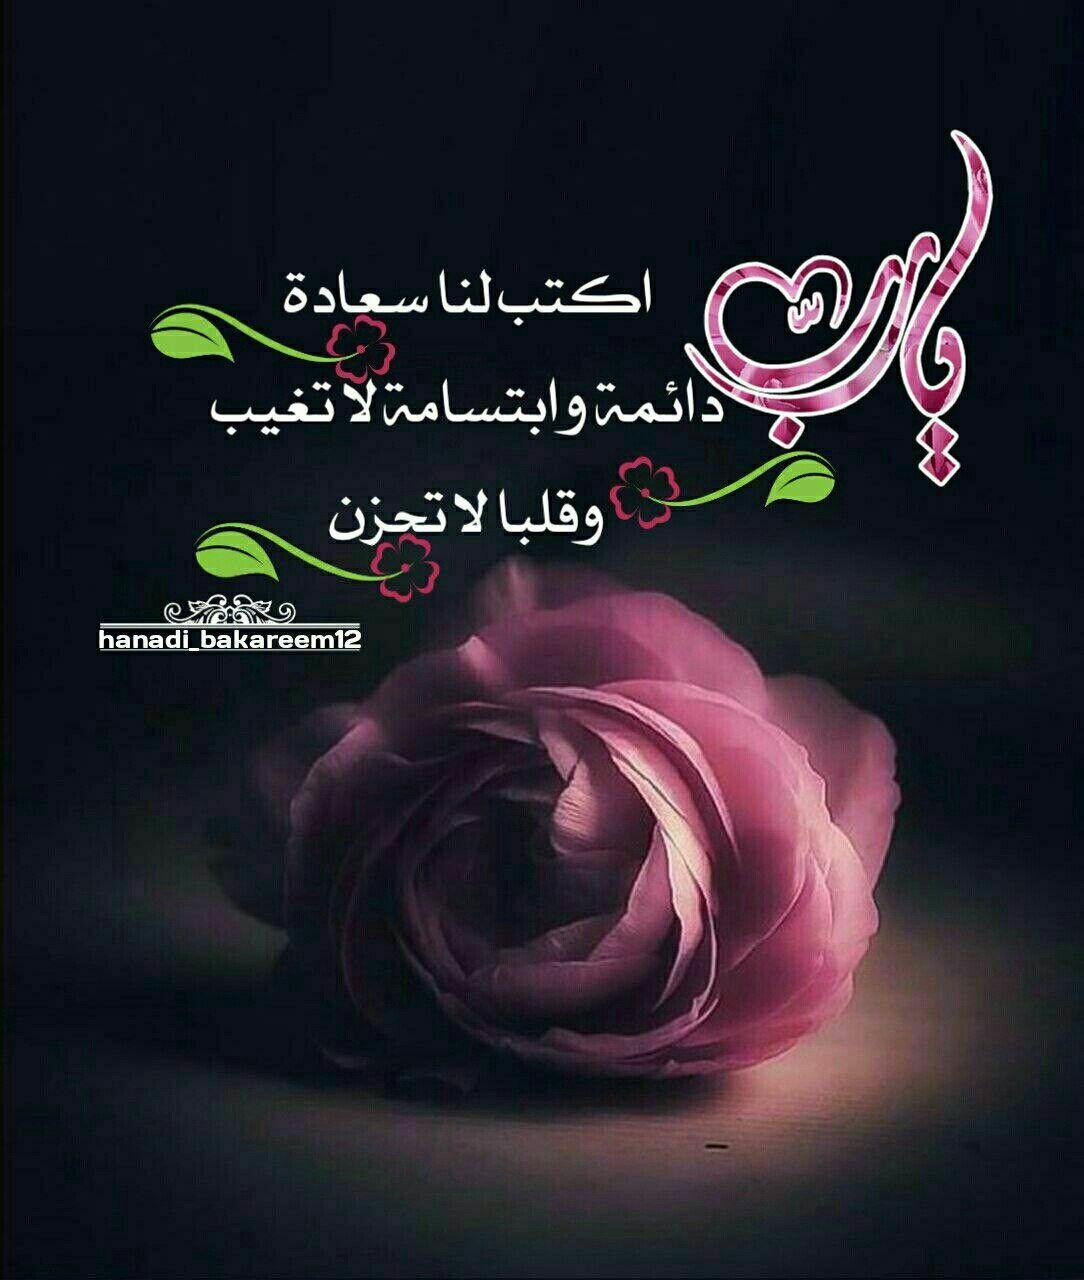 Pin By رحمة عبد الهادي On أجيب دعوة الداعي Poster Movie Posters Good Morning